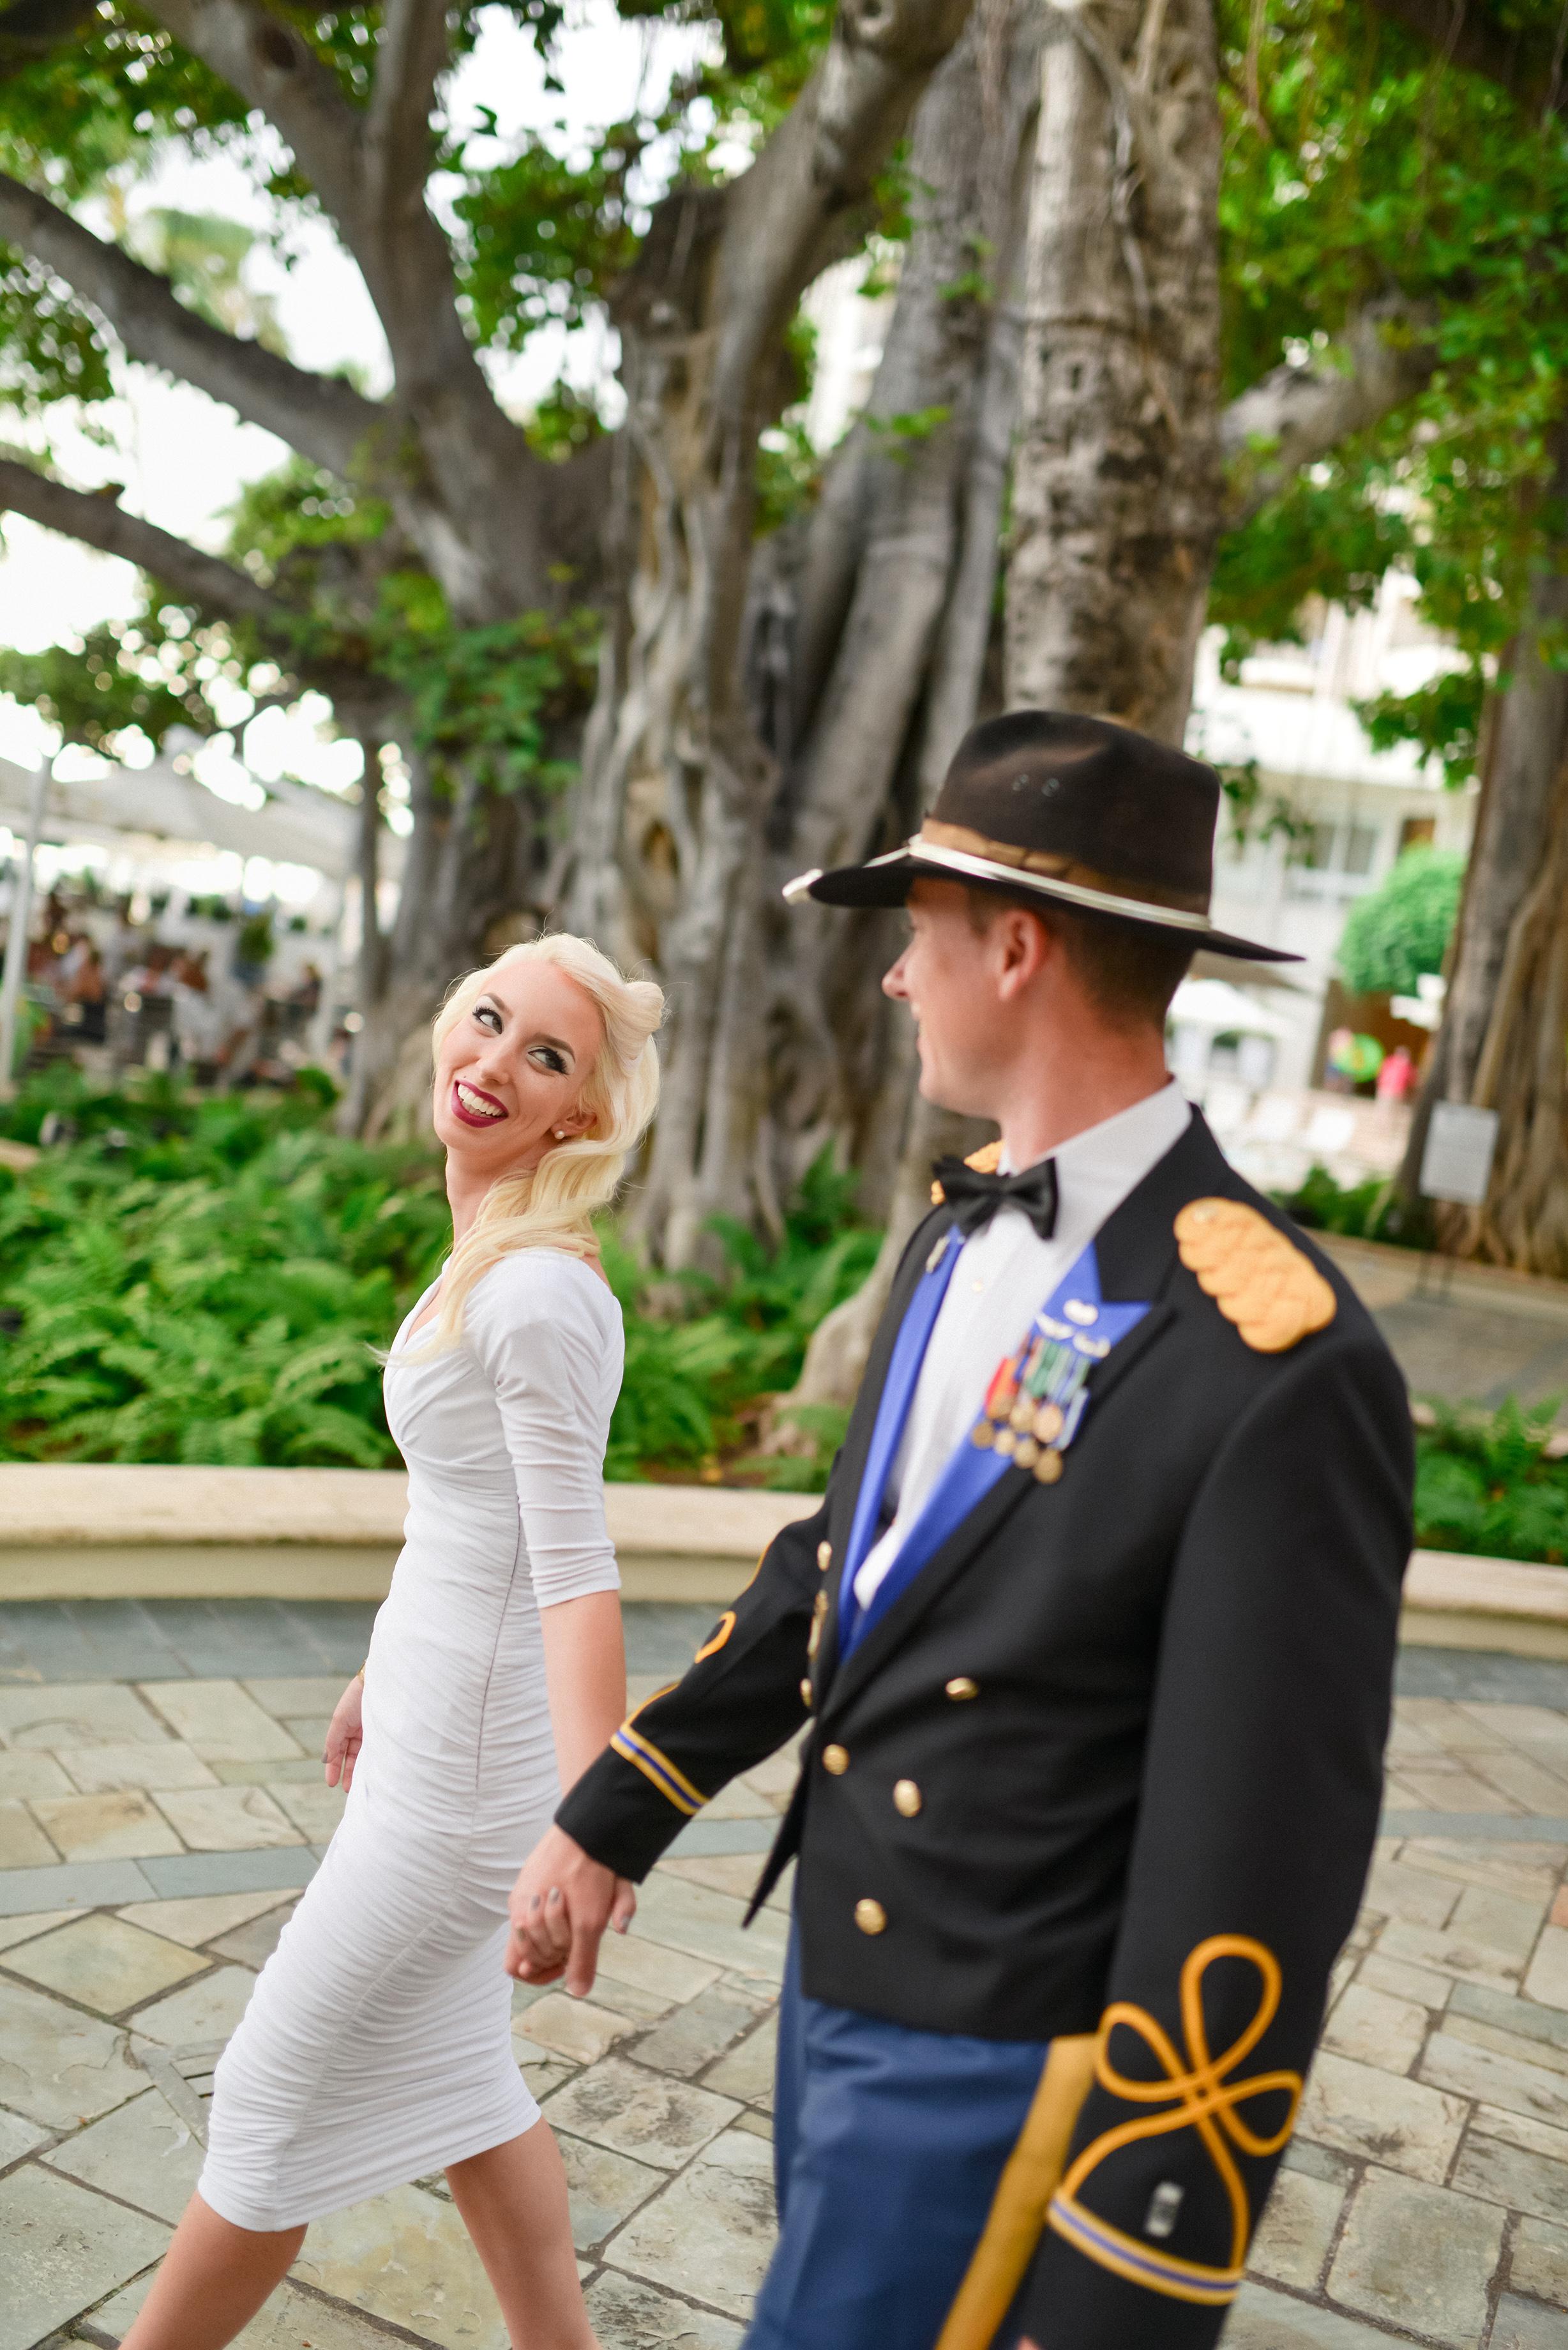 moana surfrider hotel wedding oahu hawaii stephen ludwig photography (32).jpg